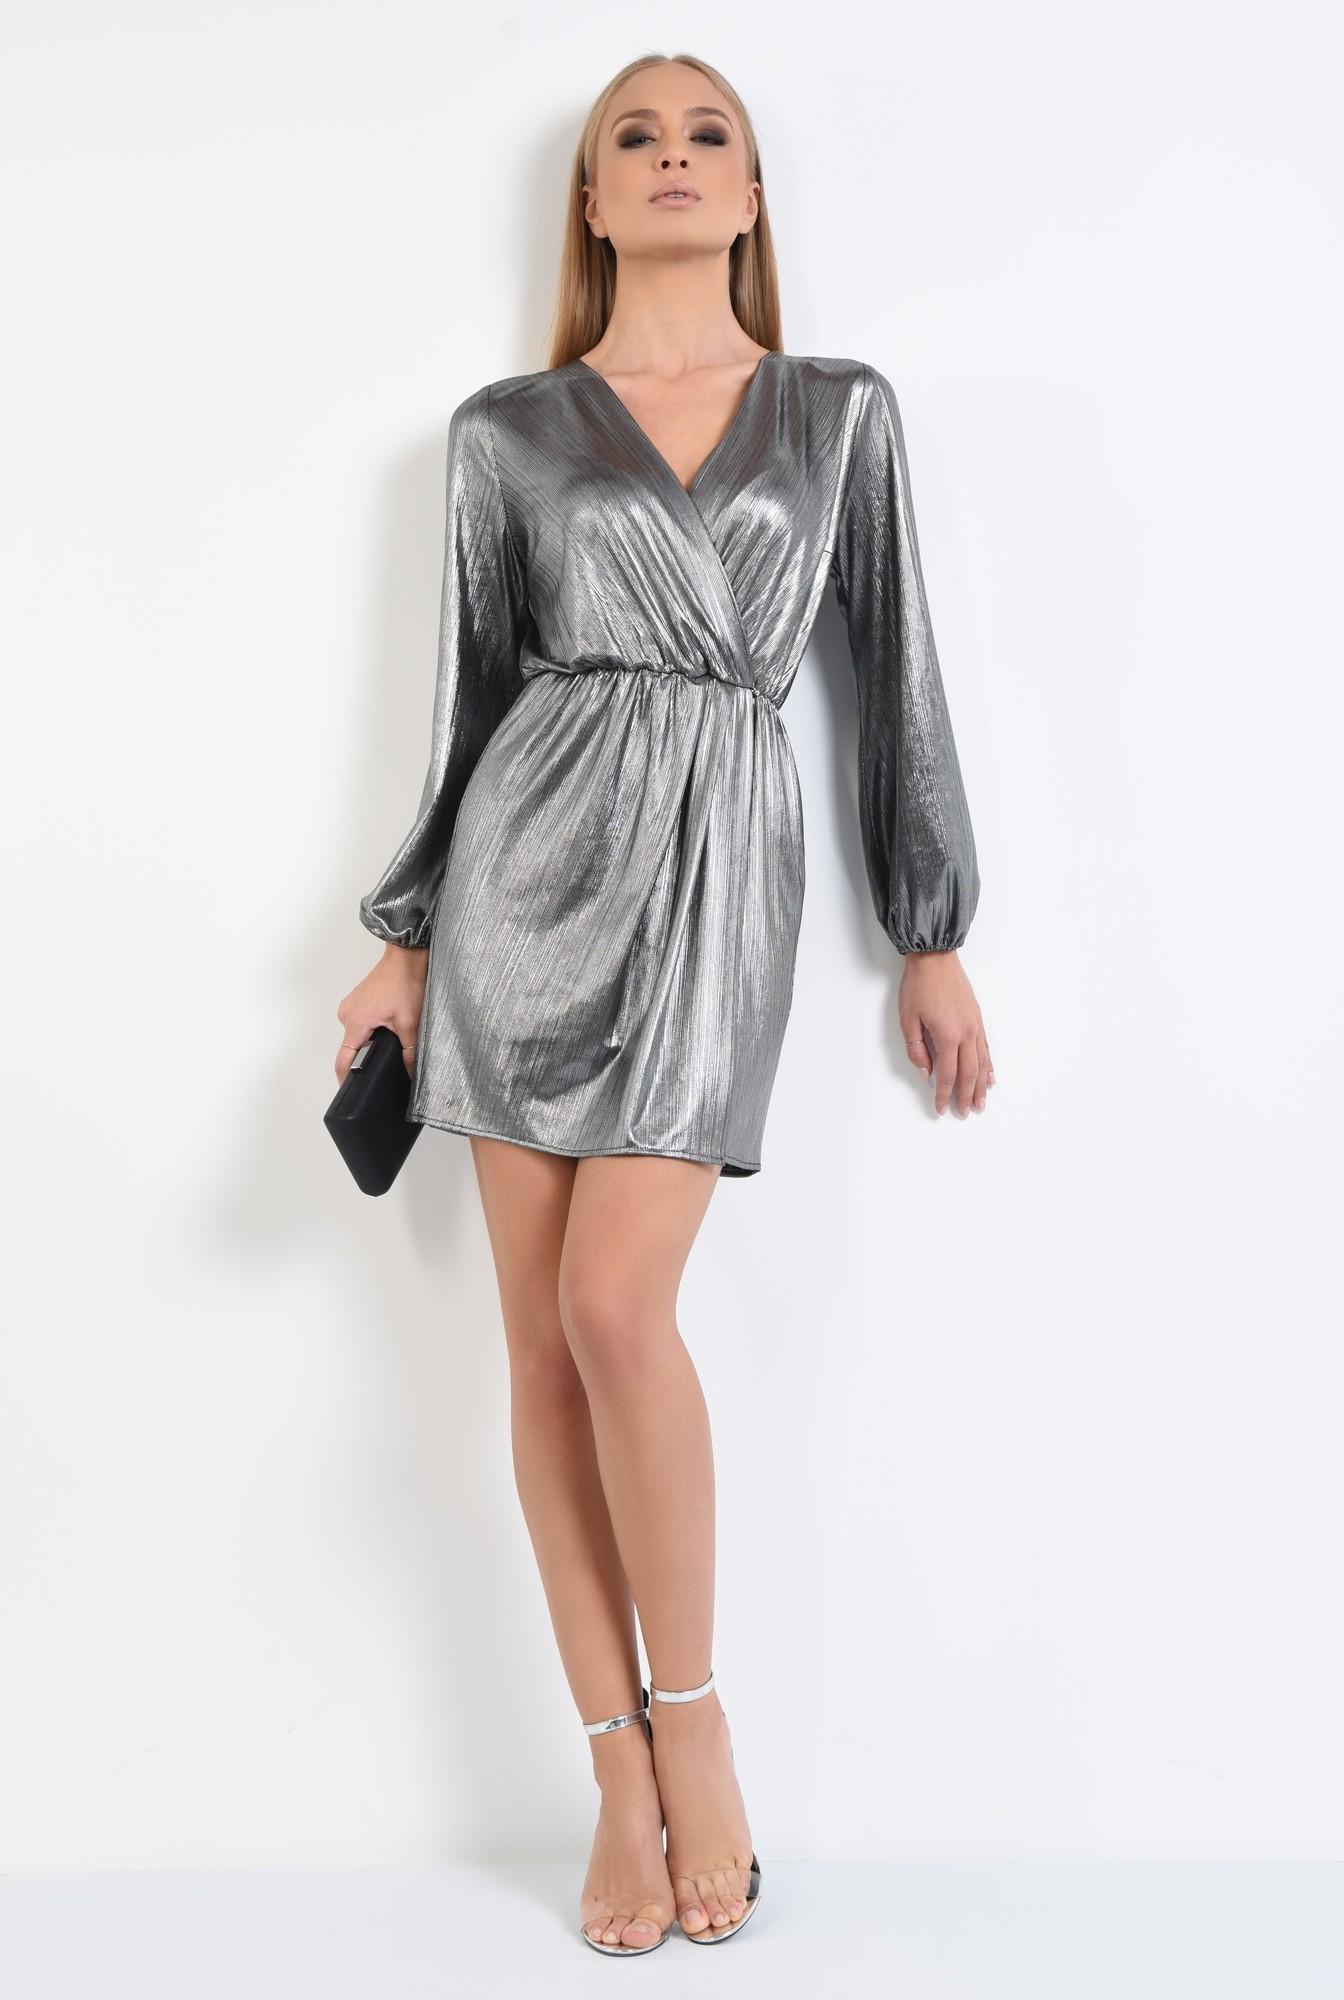 3 - rochie de seara, lurex argintiu, talie elastica, anchior petrecut